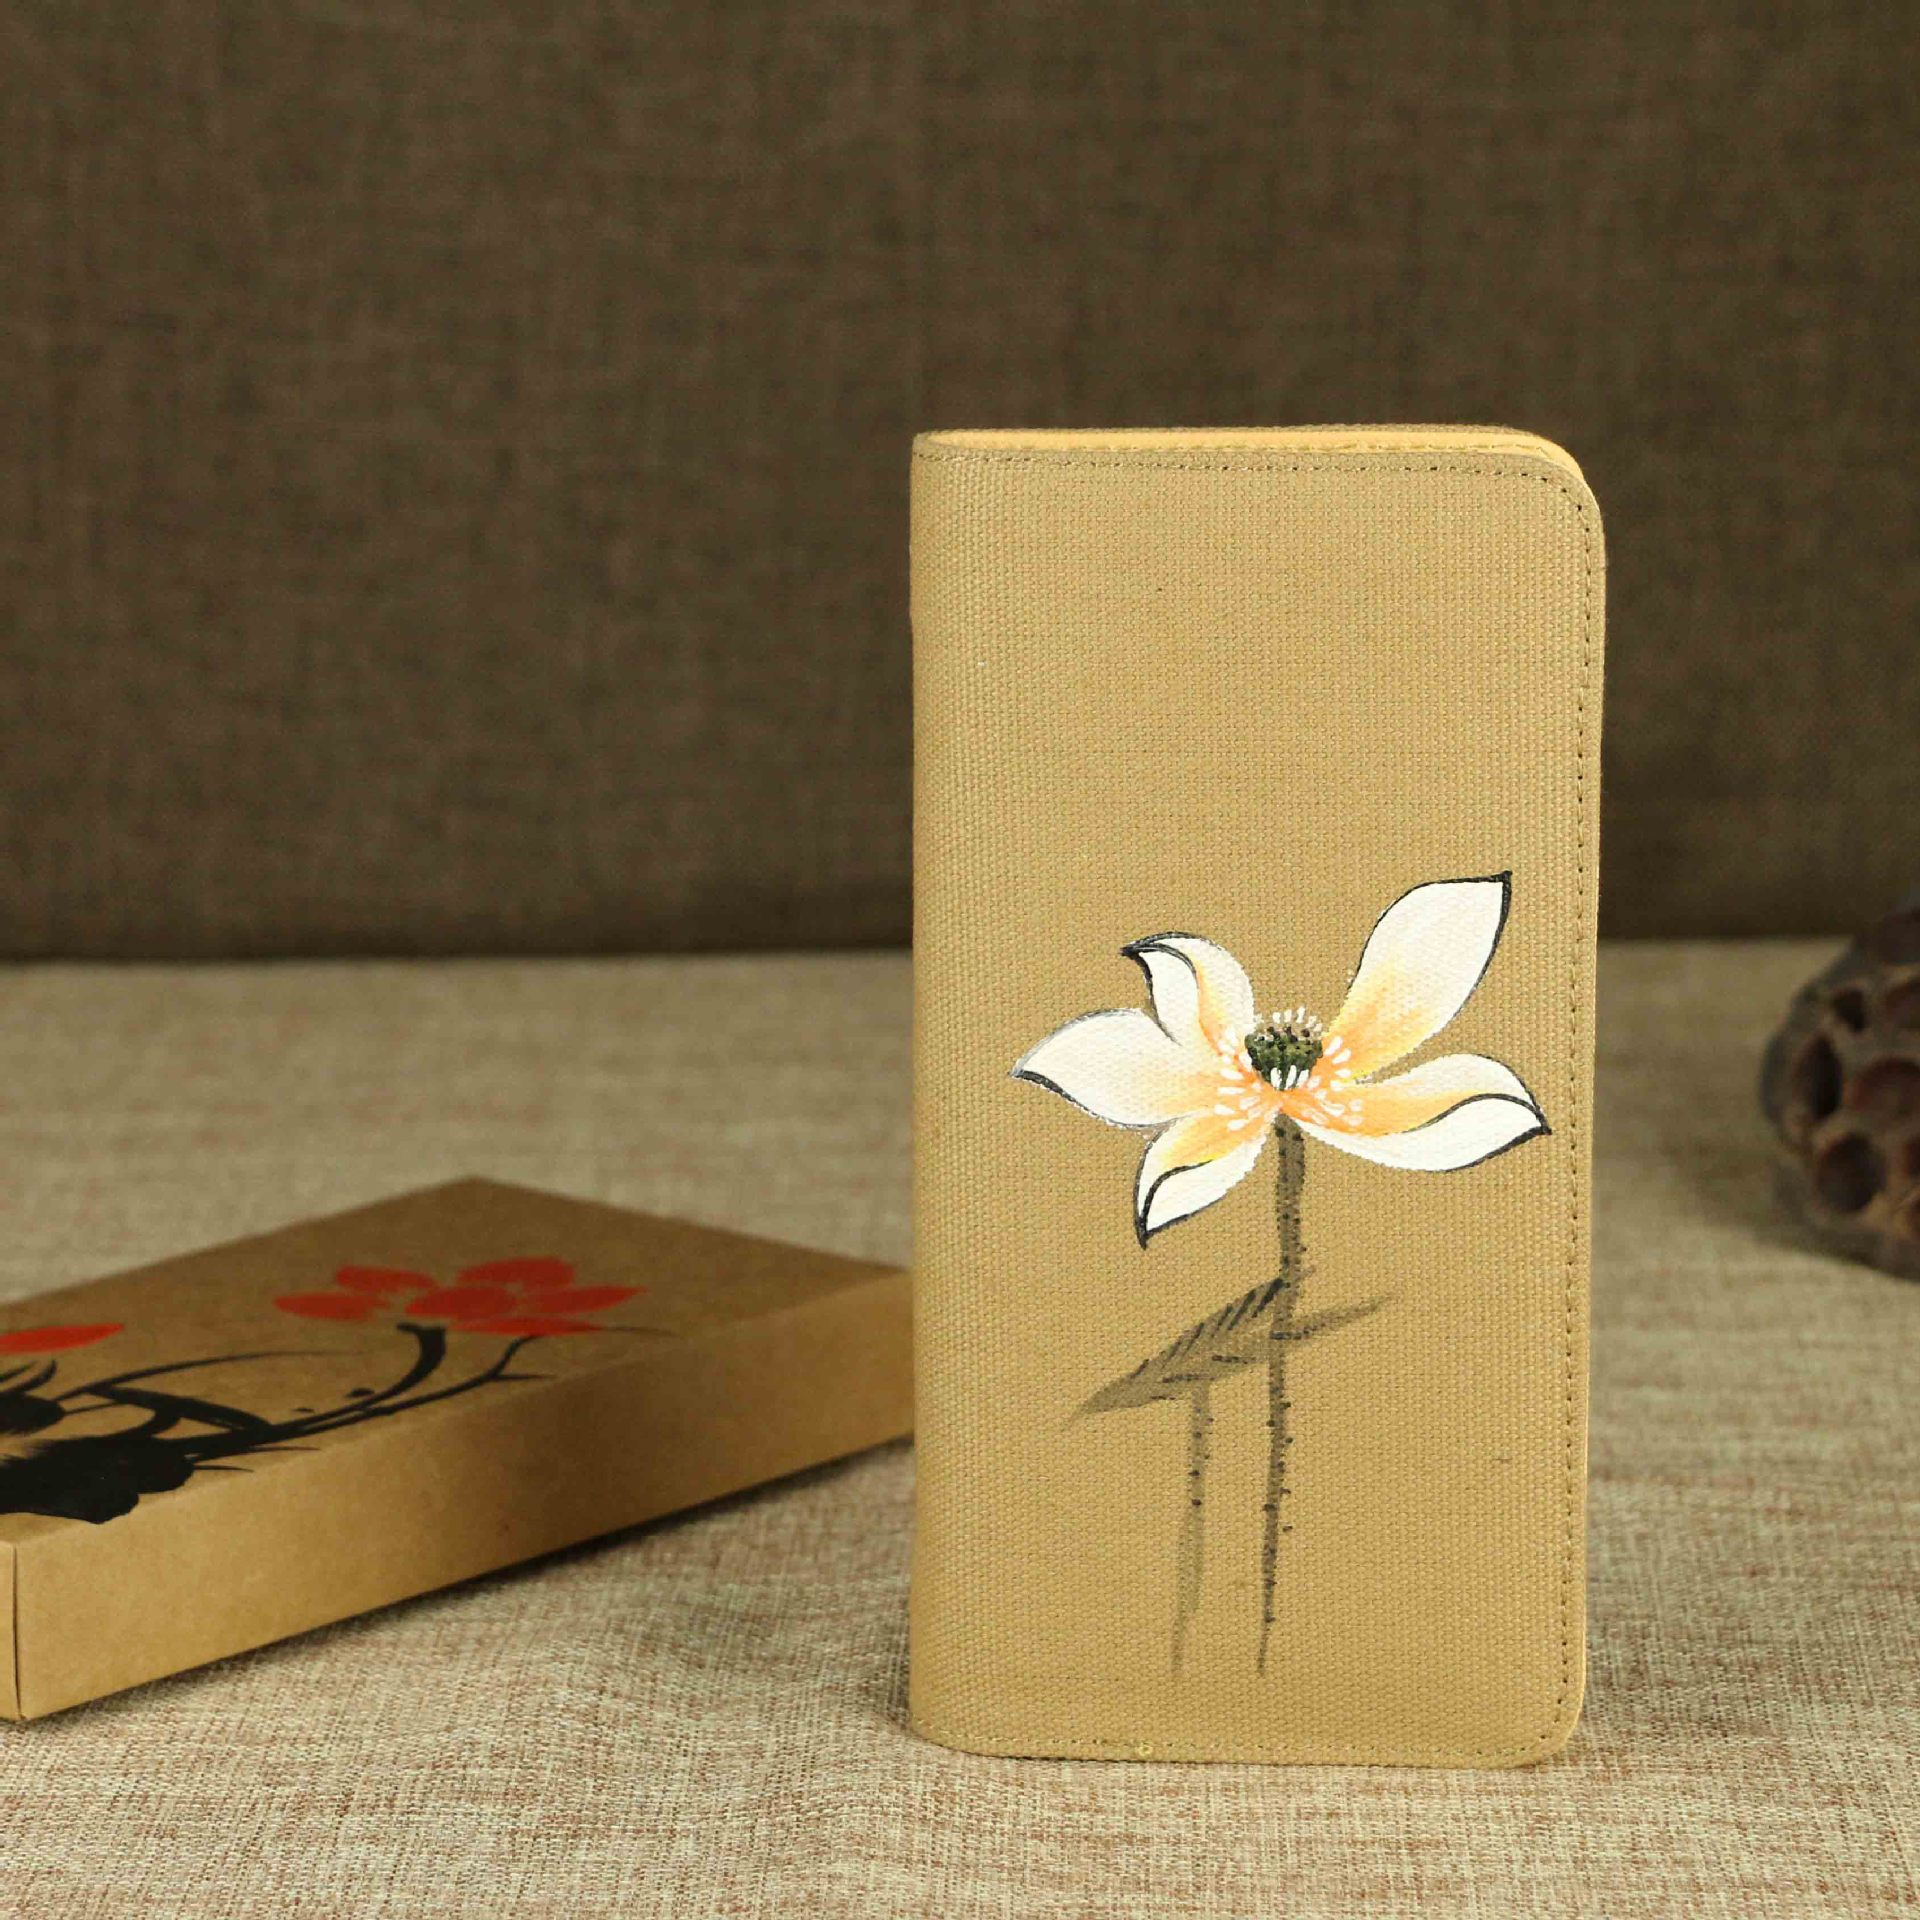 2017 Woman Wallets Purse Retro Hot Travel Painted Folk Style China Wind Original Cotton Fabric Zipper Long Standard Wallets